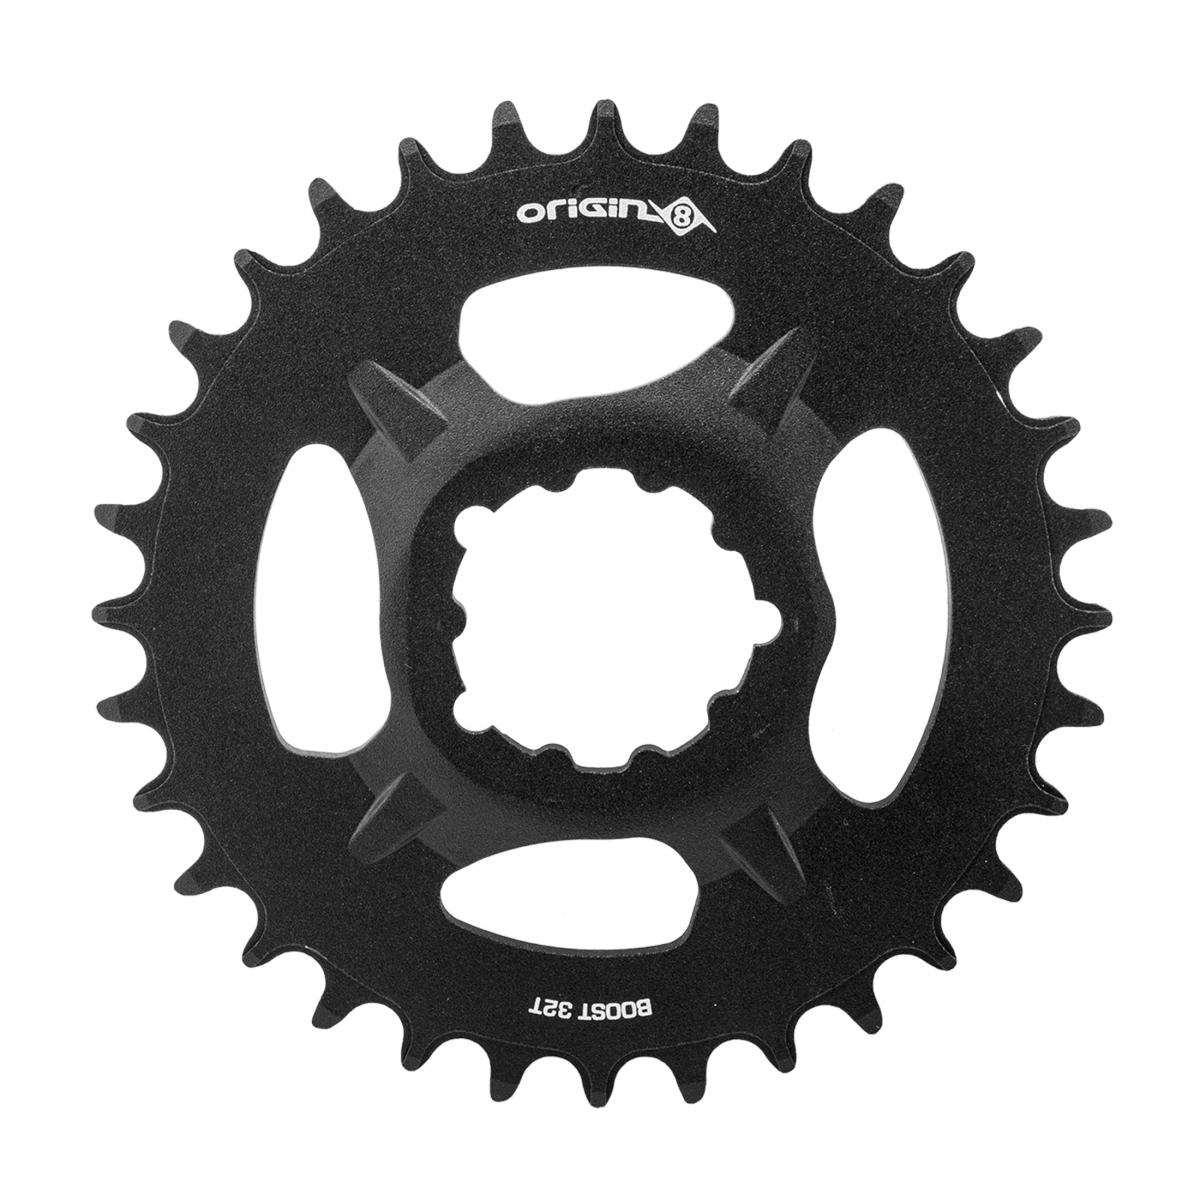 Origin8 Thruster 2x Road Direct Mount Spider chainring